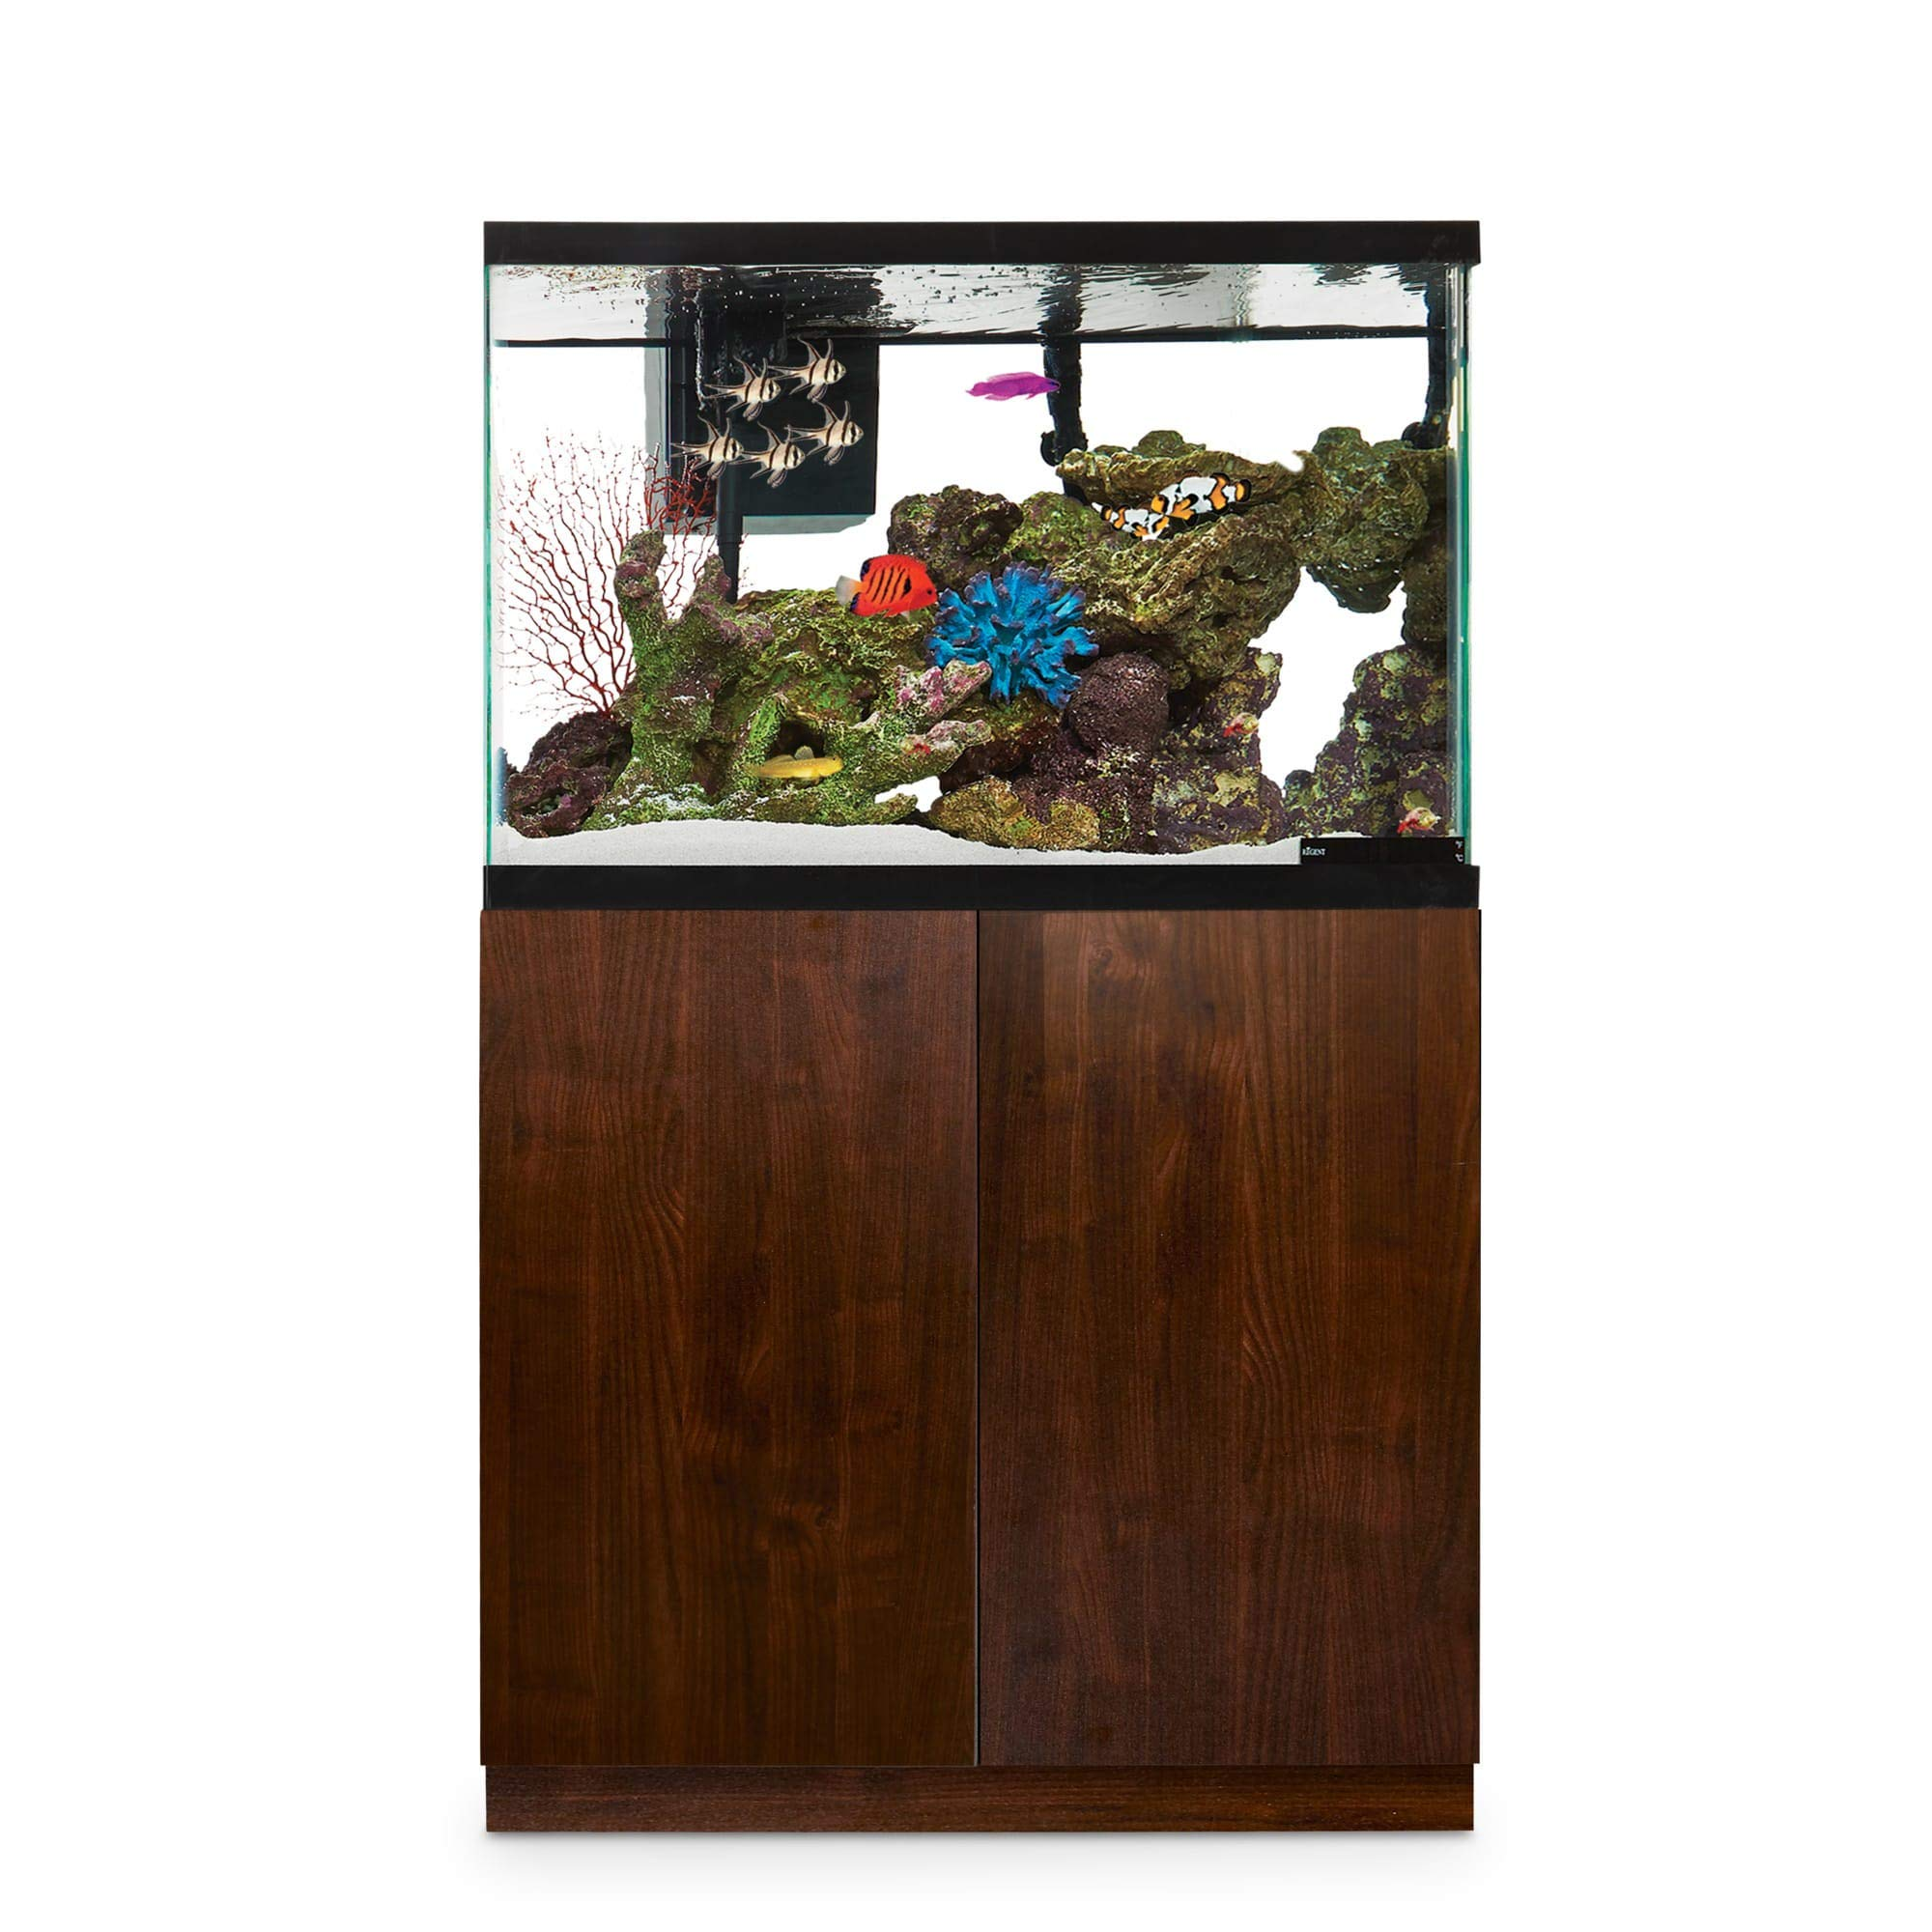 Imagitarium Faux Woodgrain Fish Tank Stand, Up to 40 Gal.